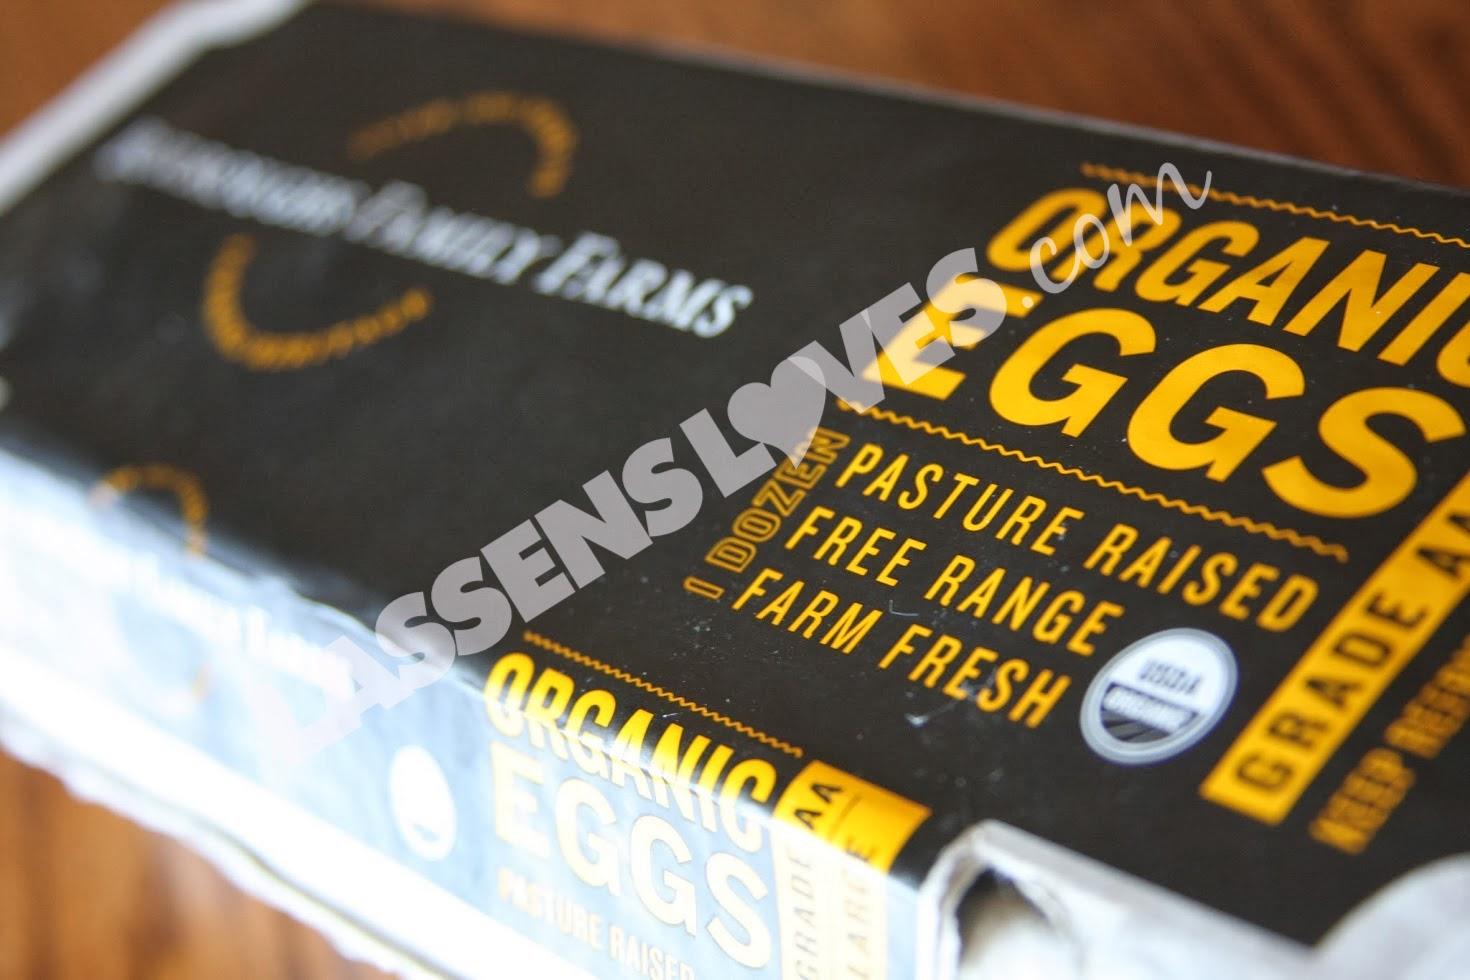 lassensloves.com, Lassen's, Lassens, Burroughs+Family+Farm+Eggs